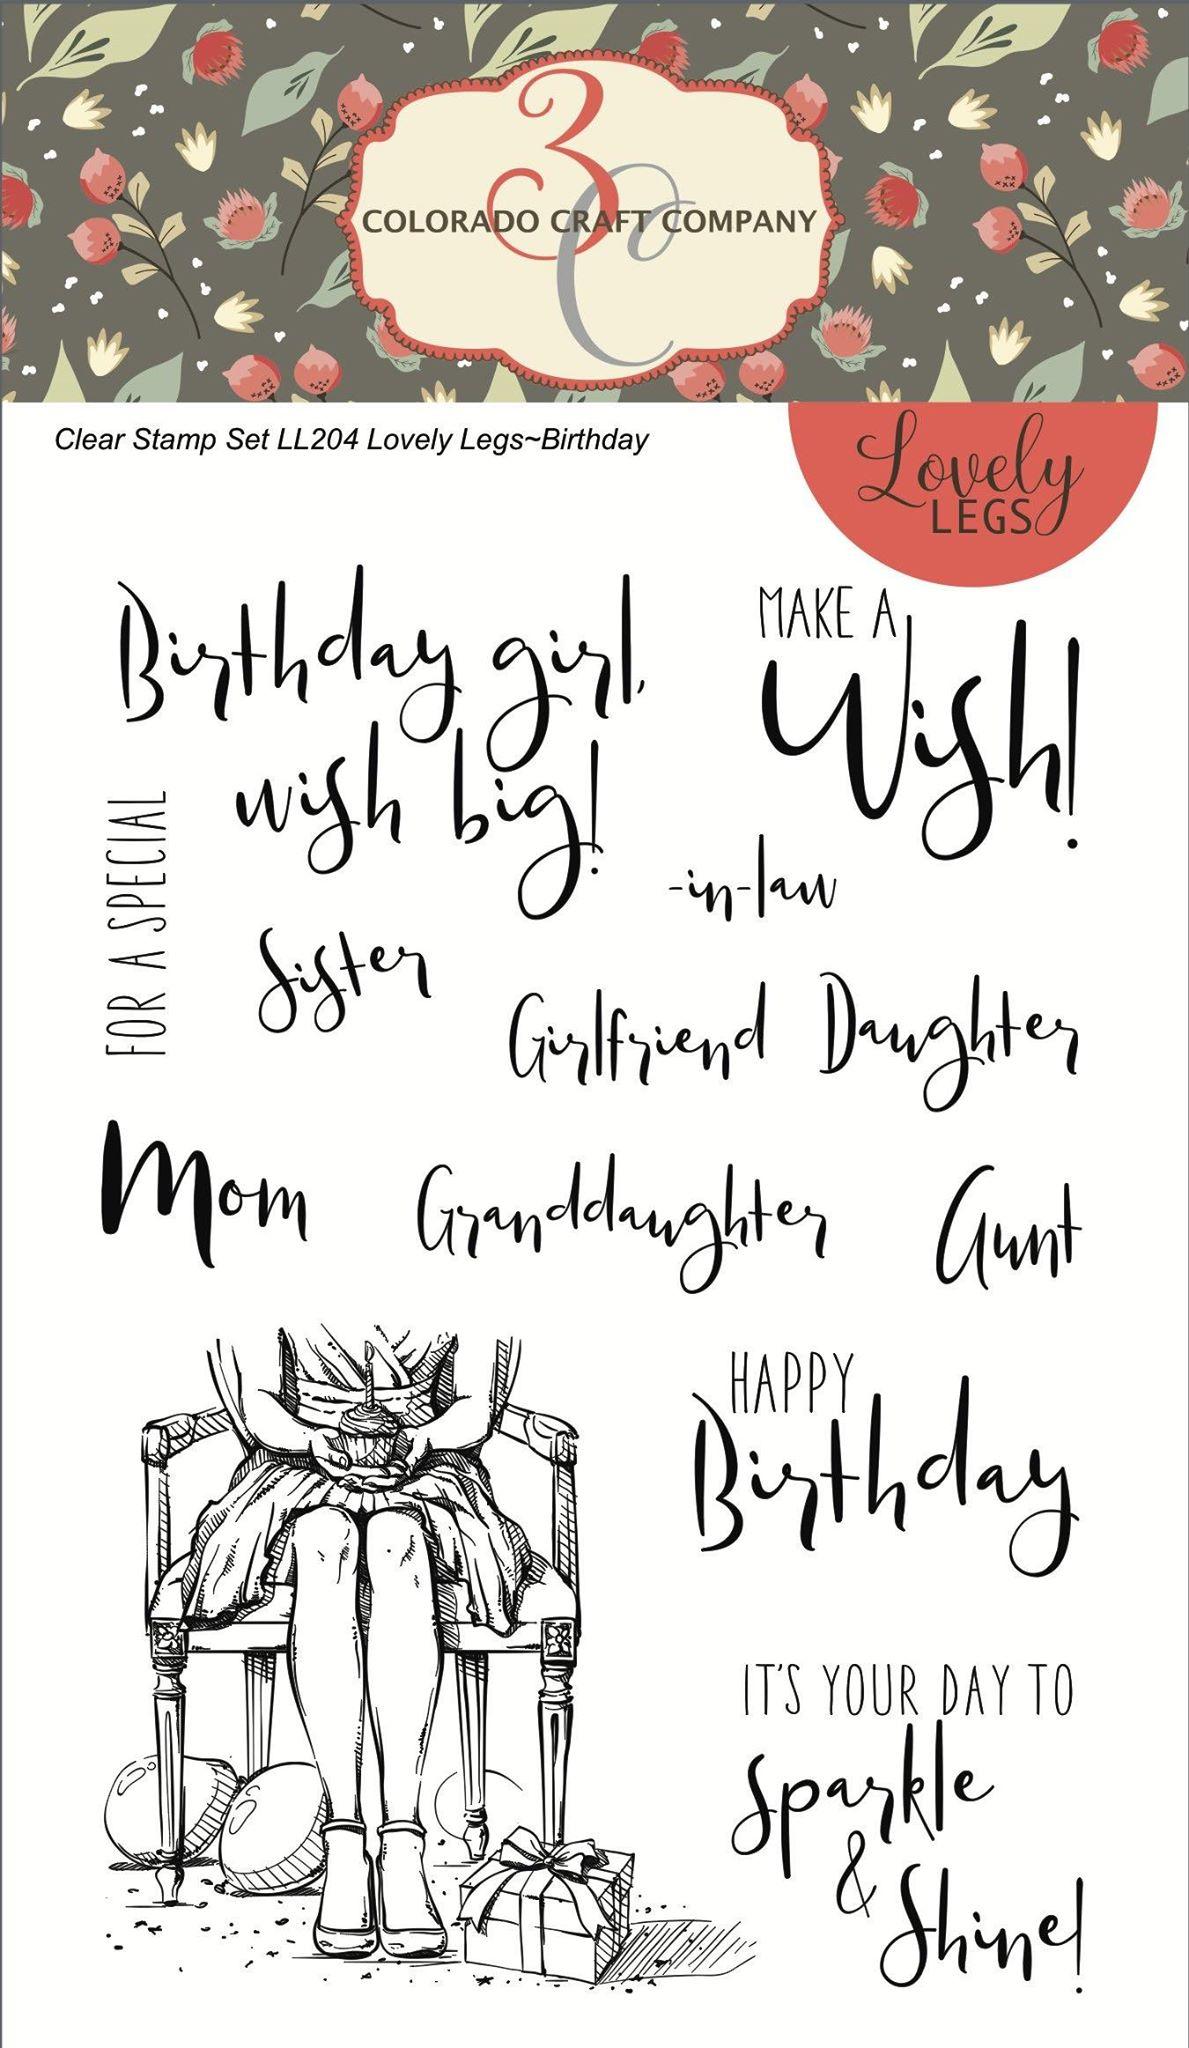 Colorado Craft Co. - Lovely Legs Happy Birthday Stamp Set